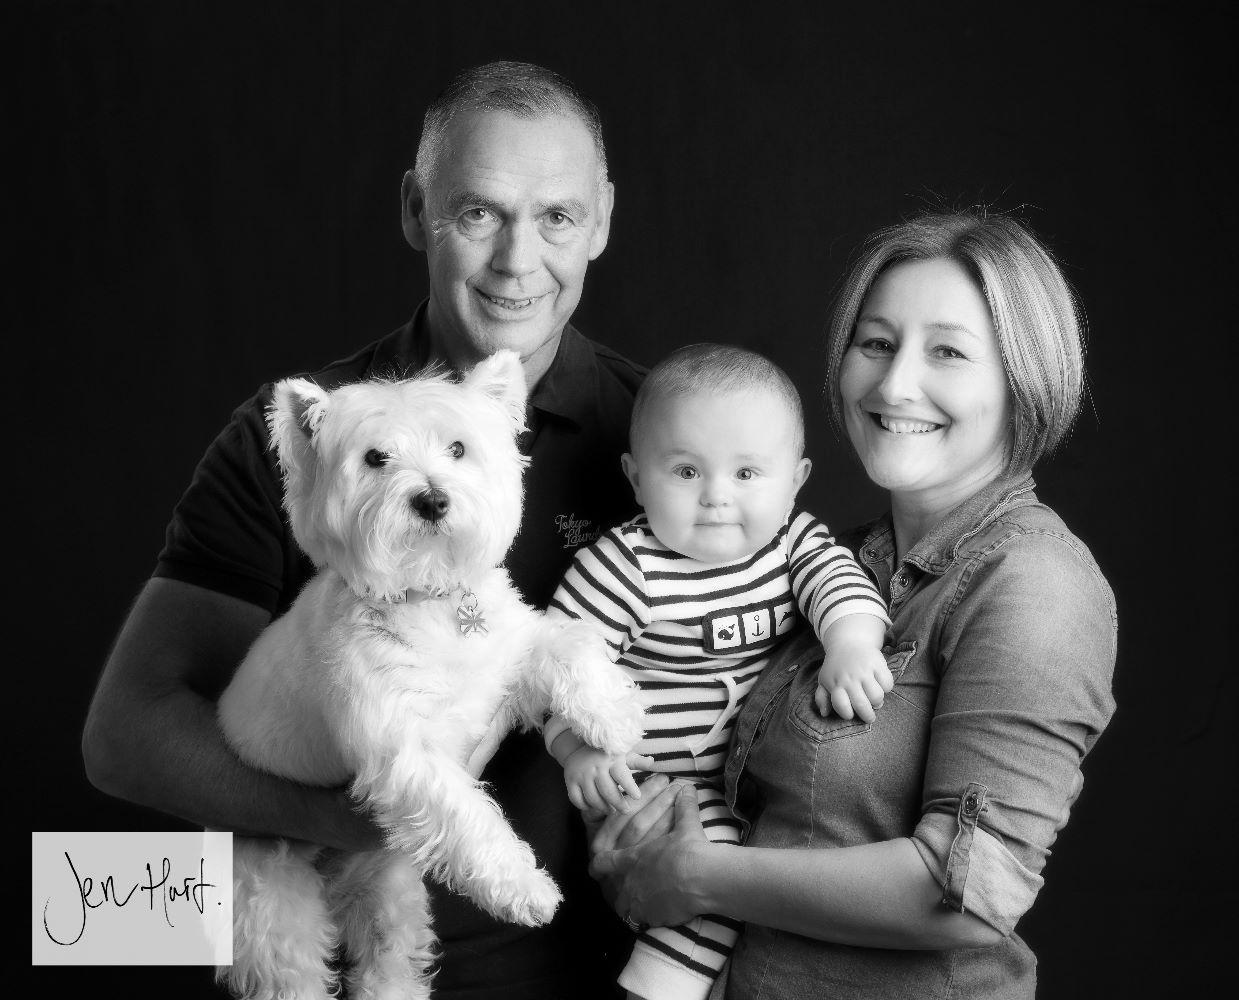 Baby-Family-Photography-Teddy- 15September17_008